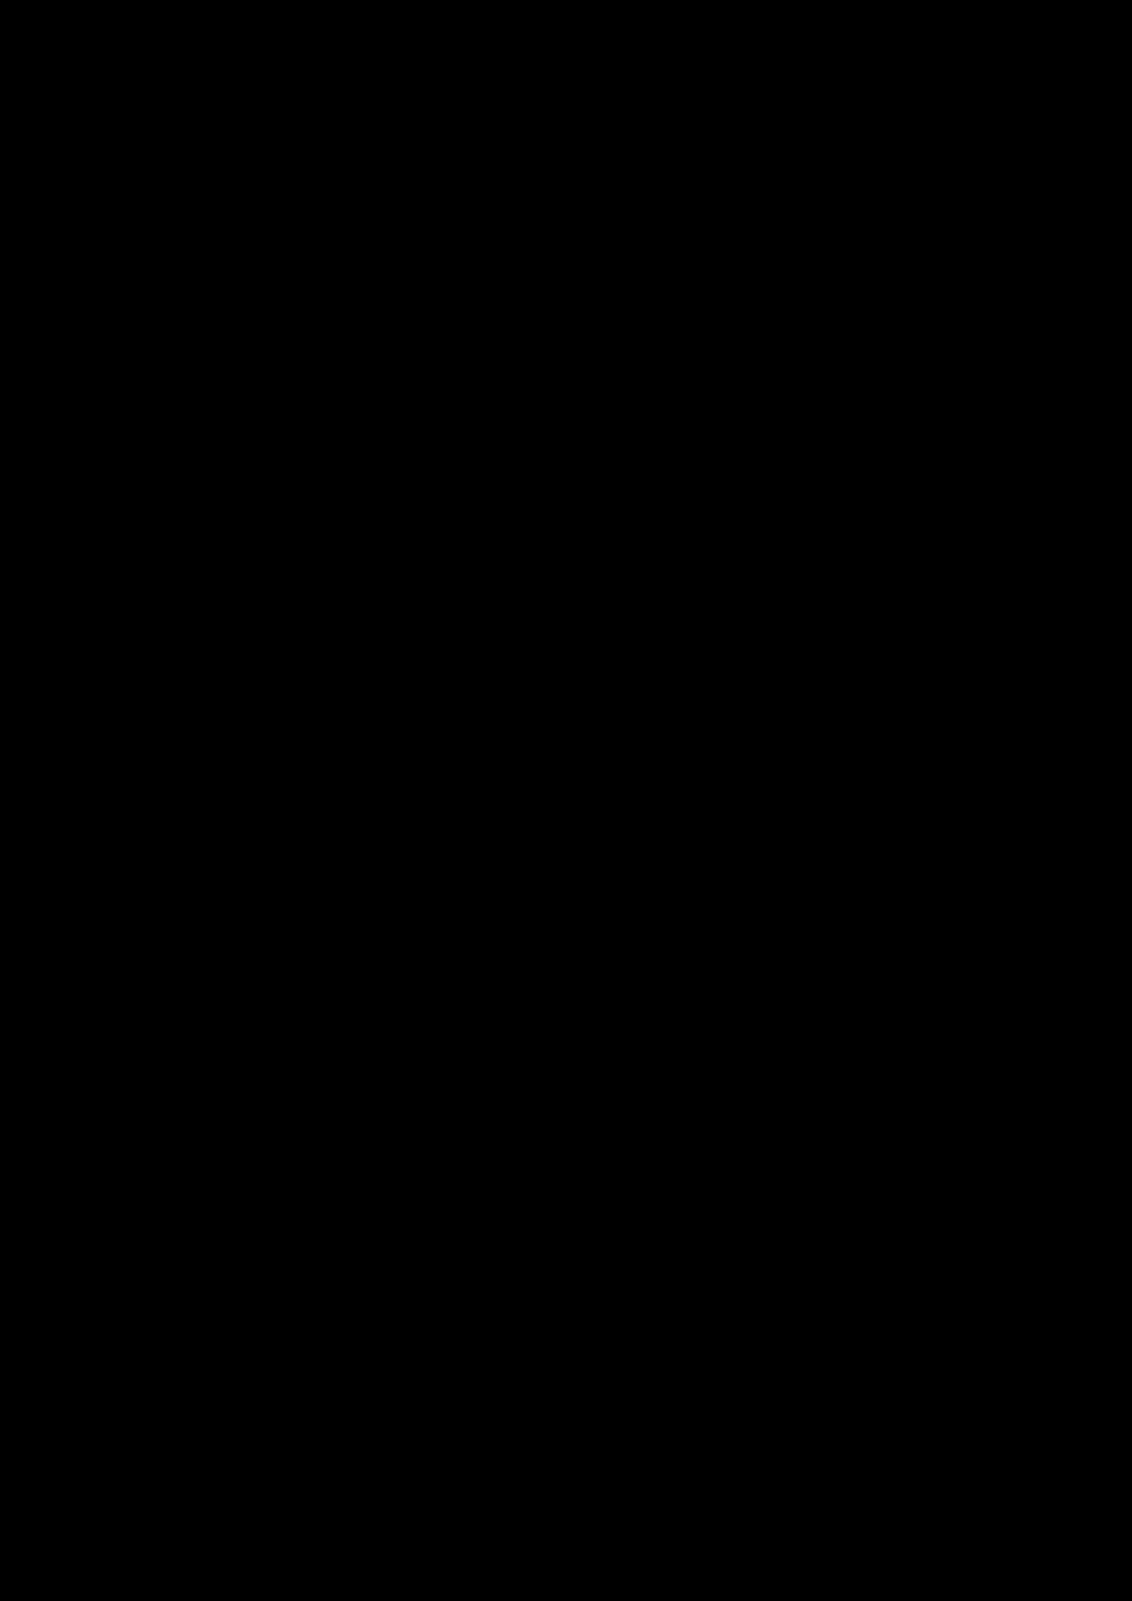 18 berez slide, Image 25